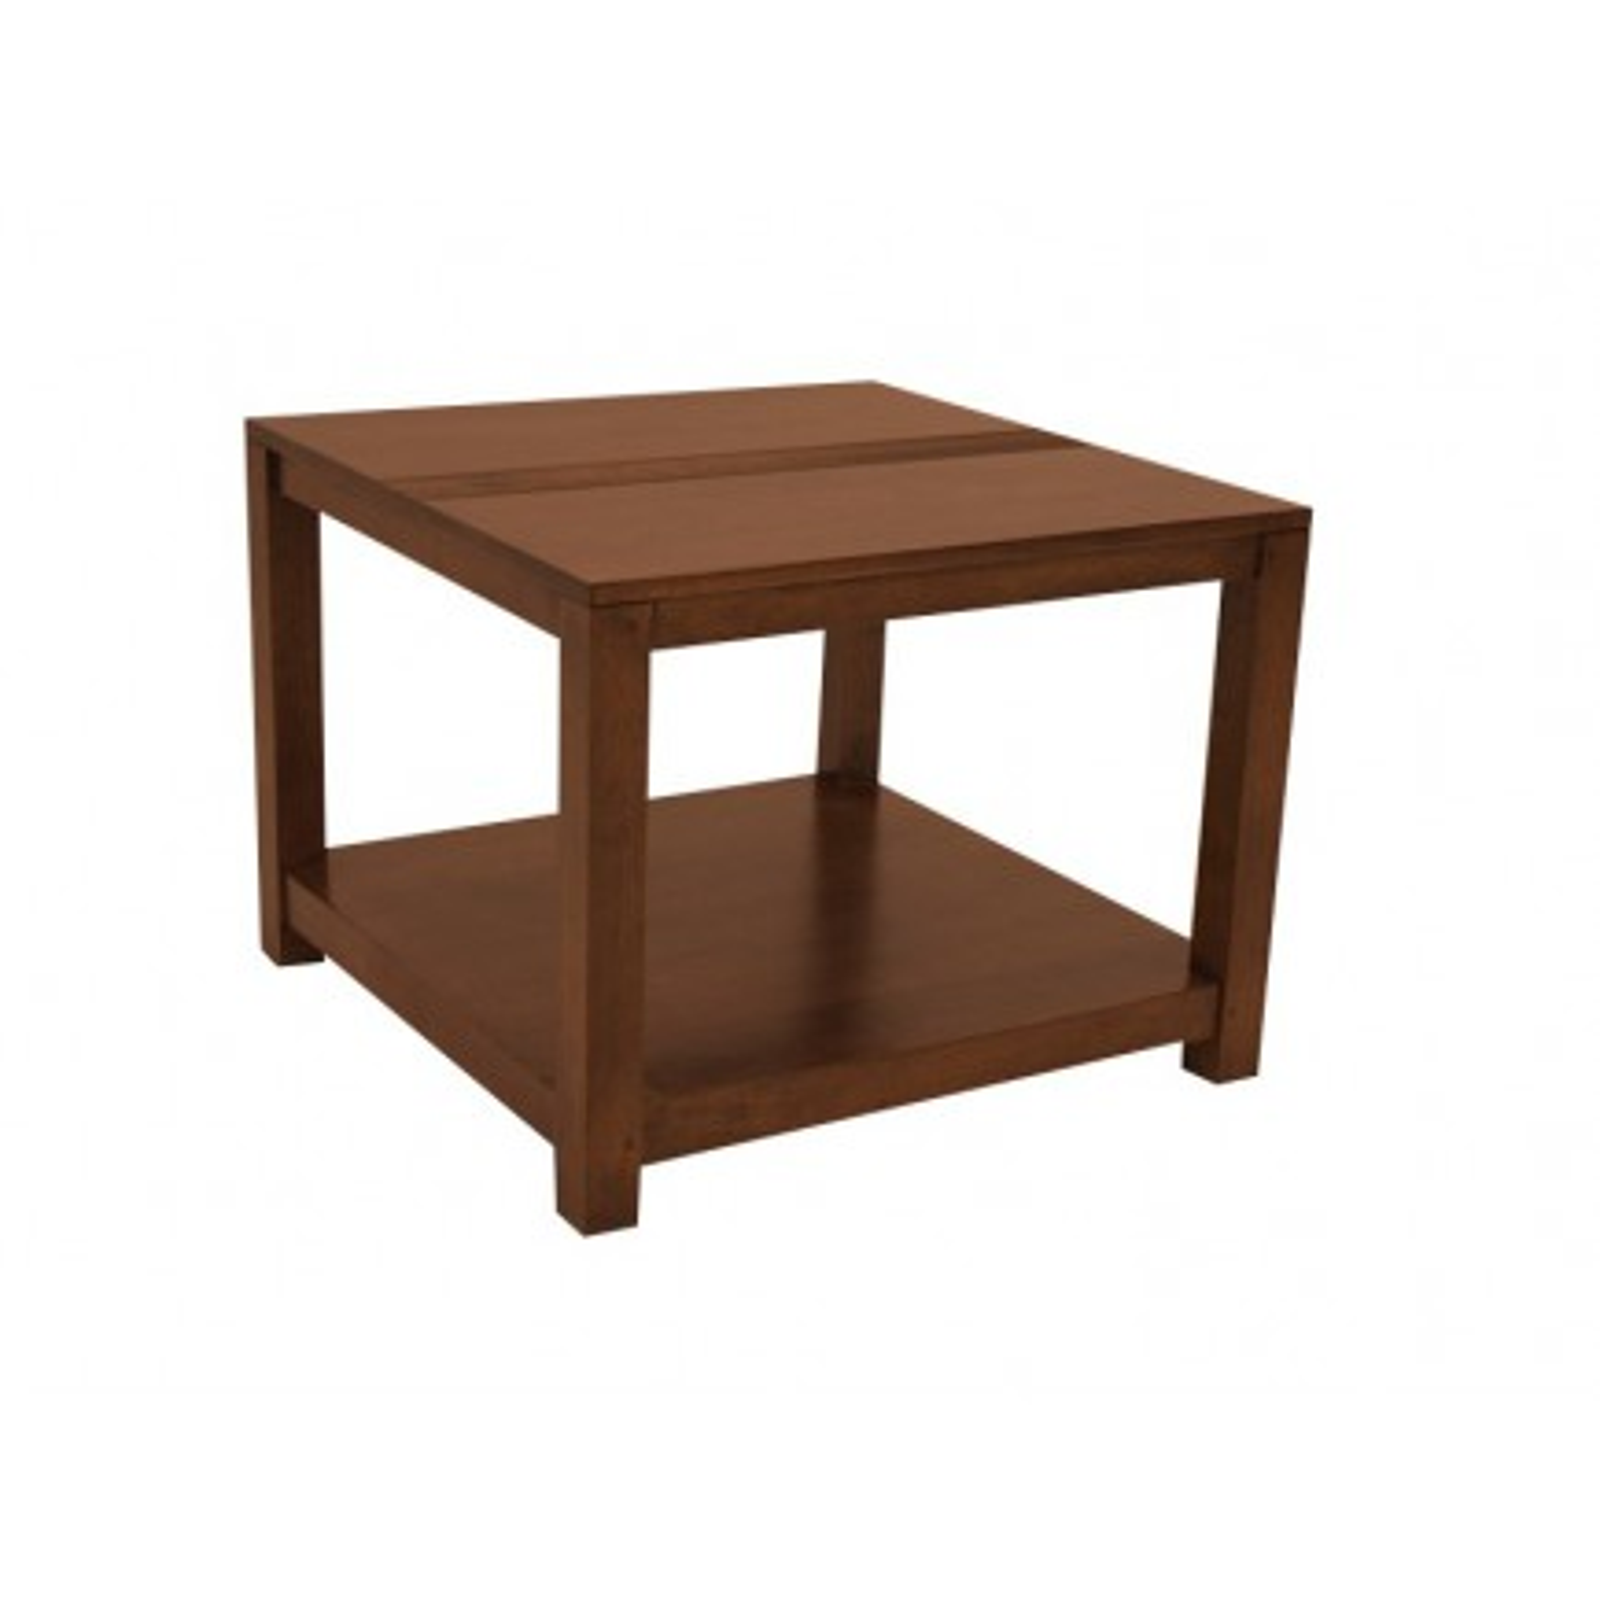 Table Basse Carrée Striée Siguiri Hévéa - meuble bois massif